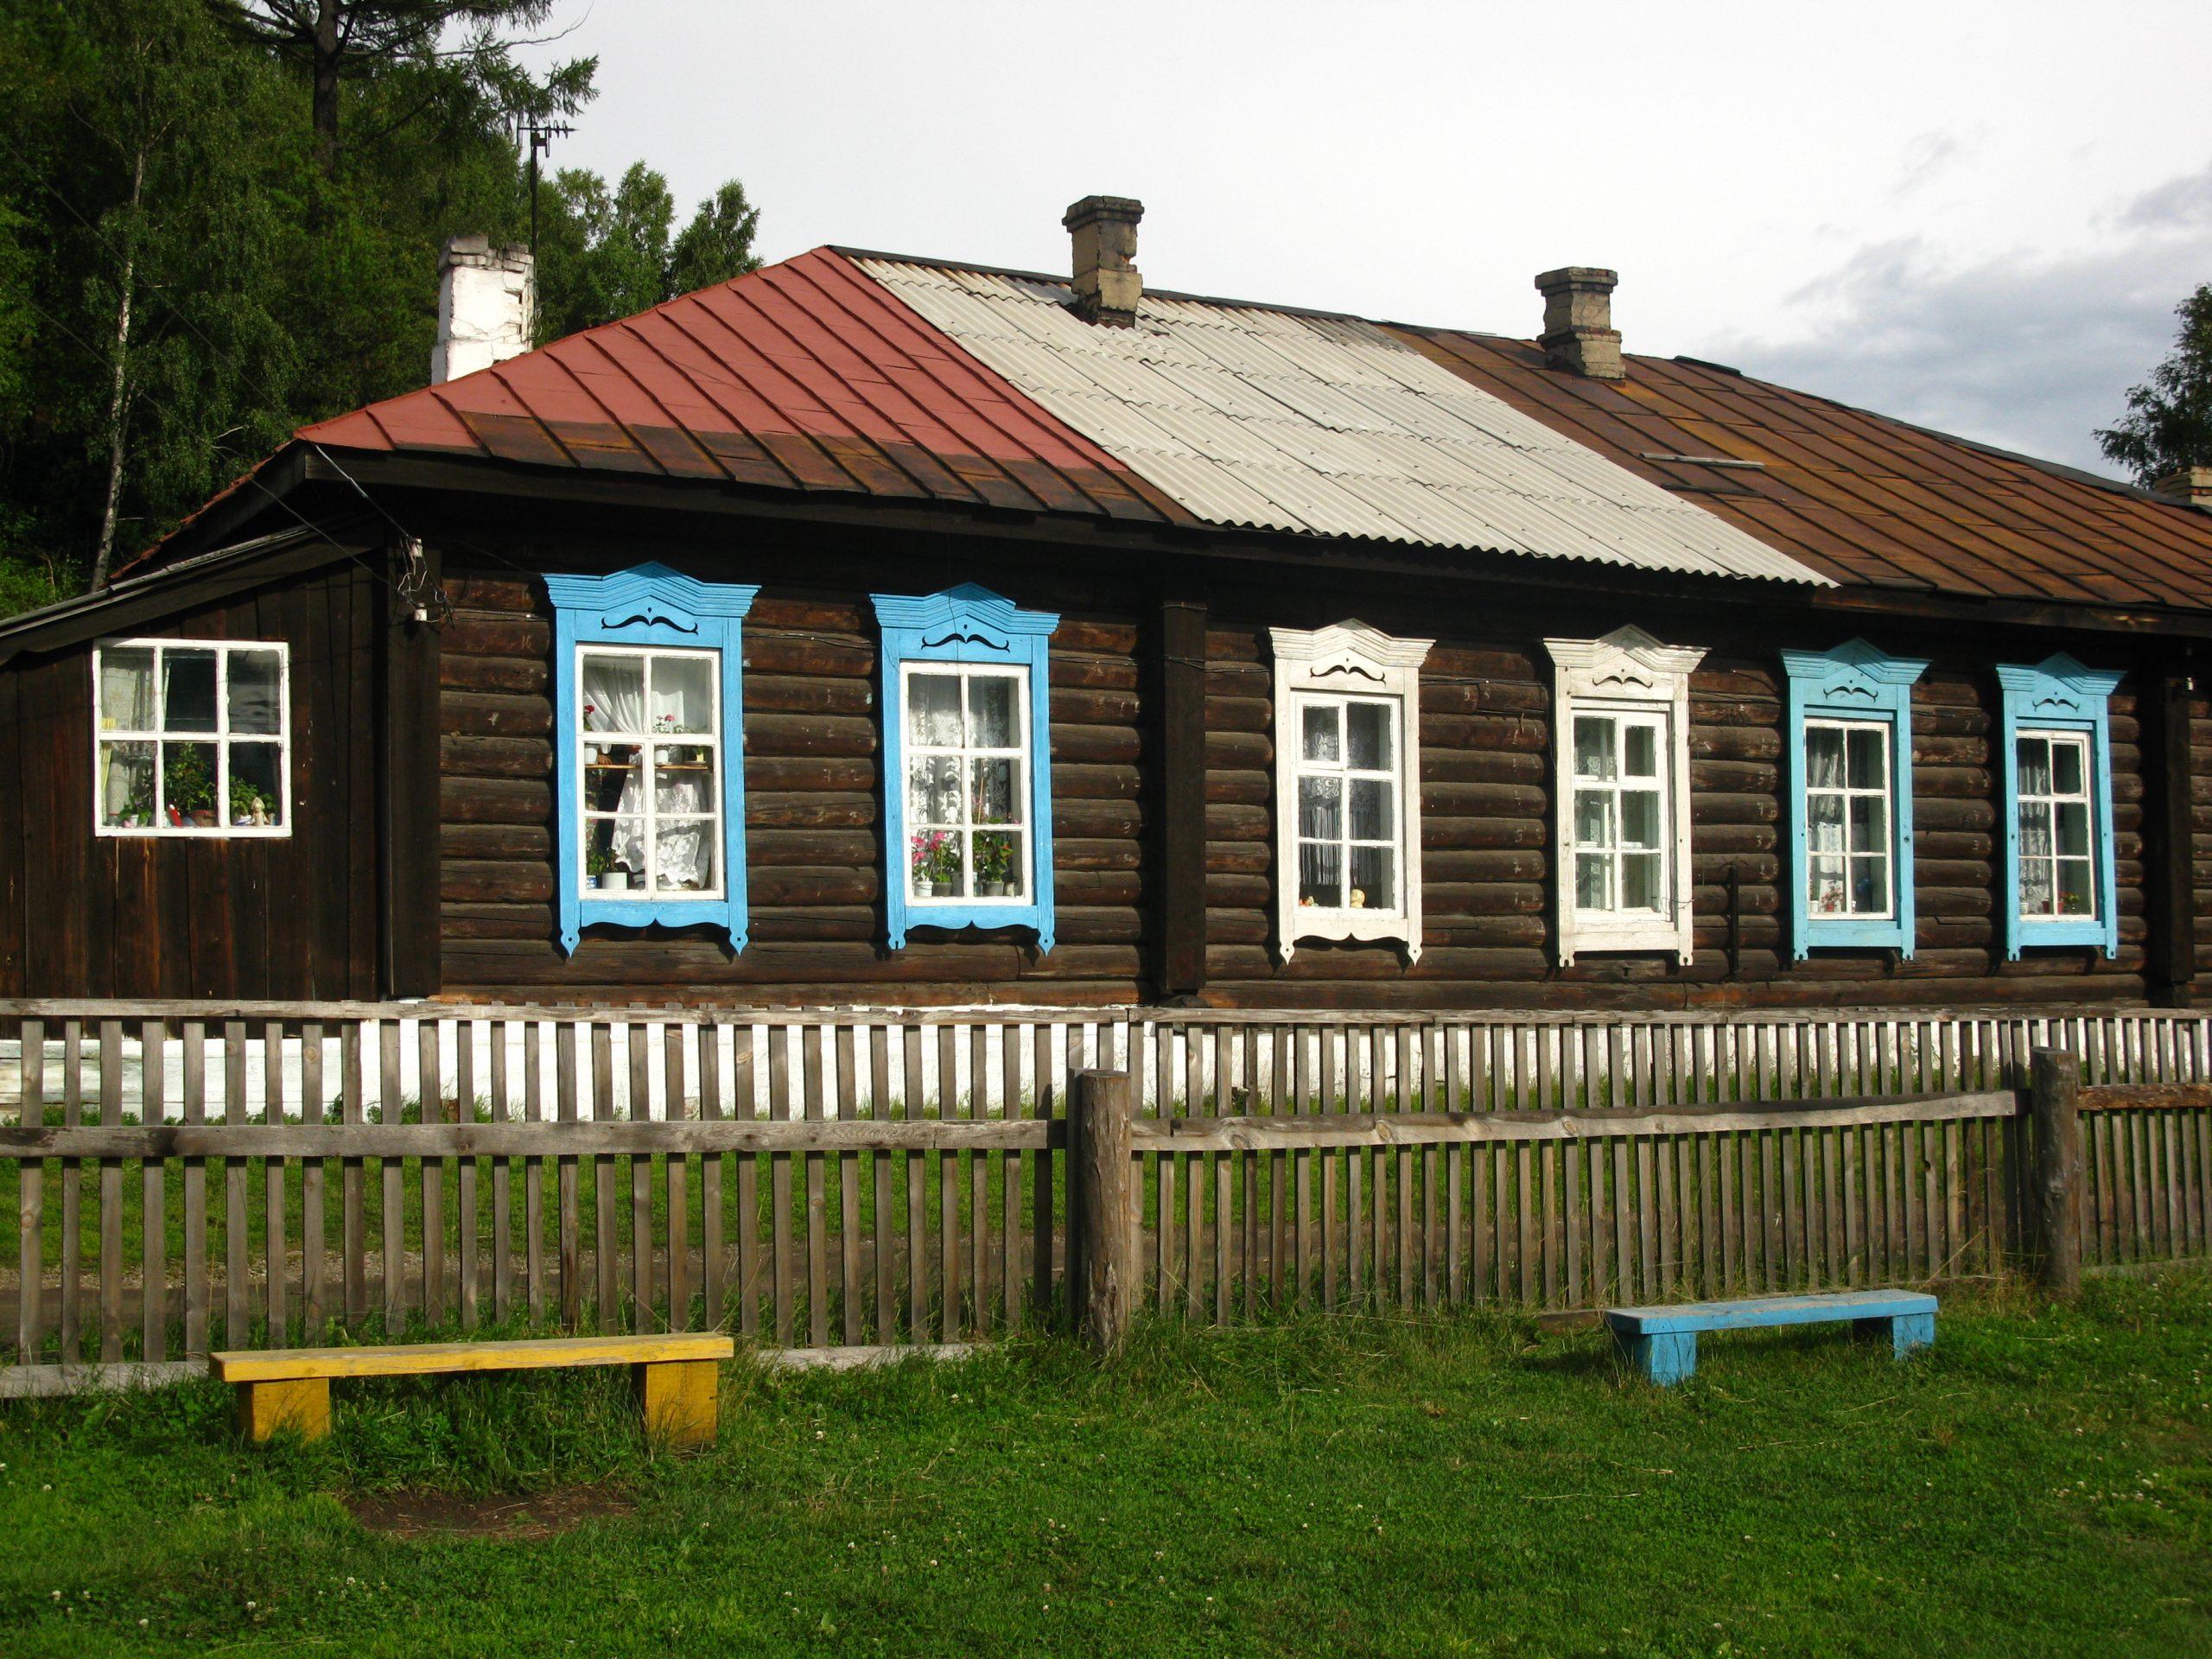 Altai-Baikal-Moskau 2010 056